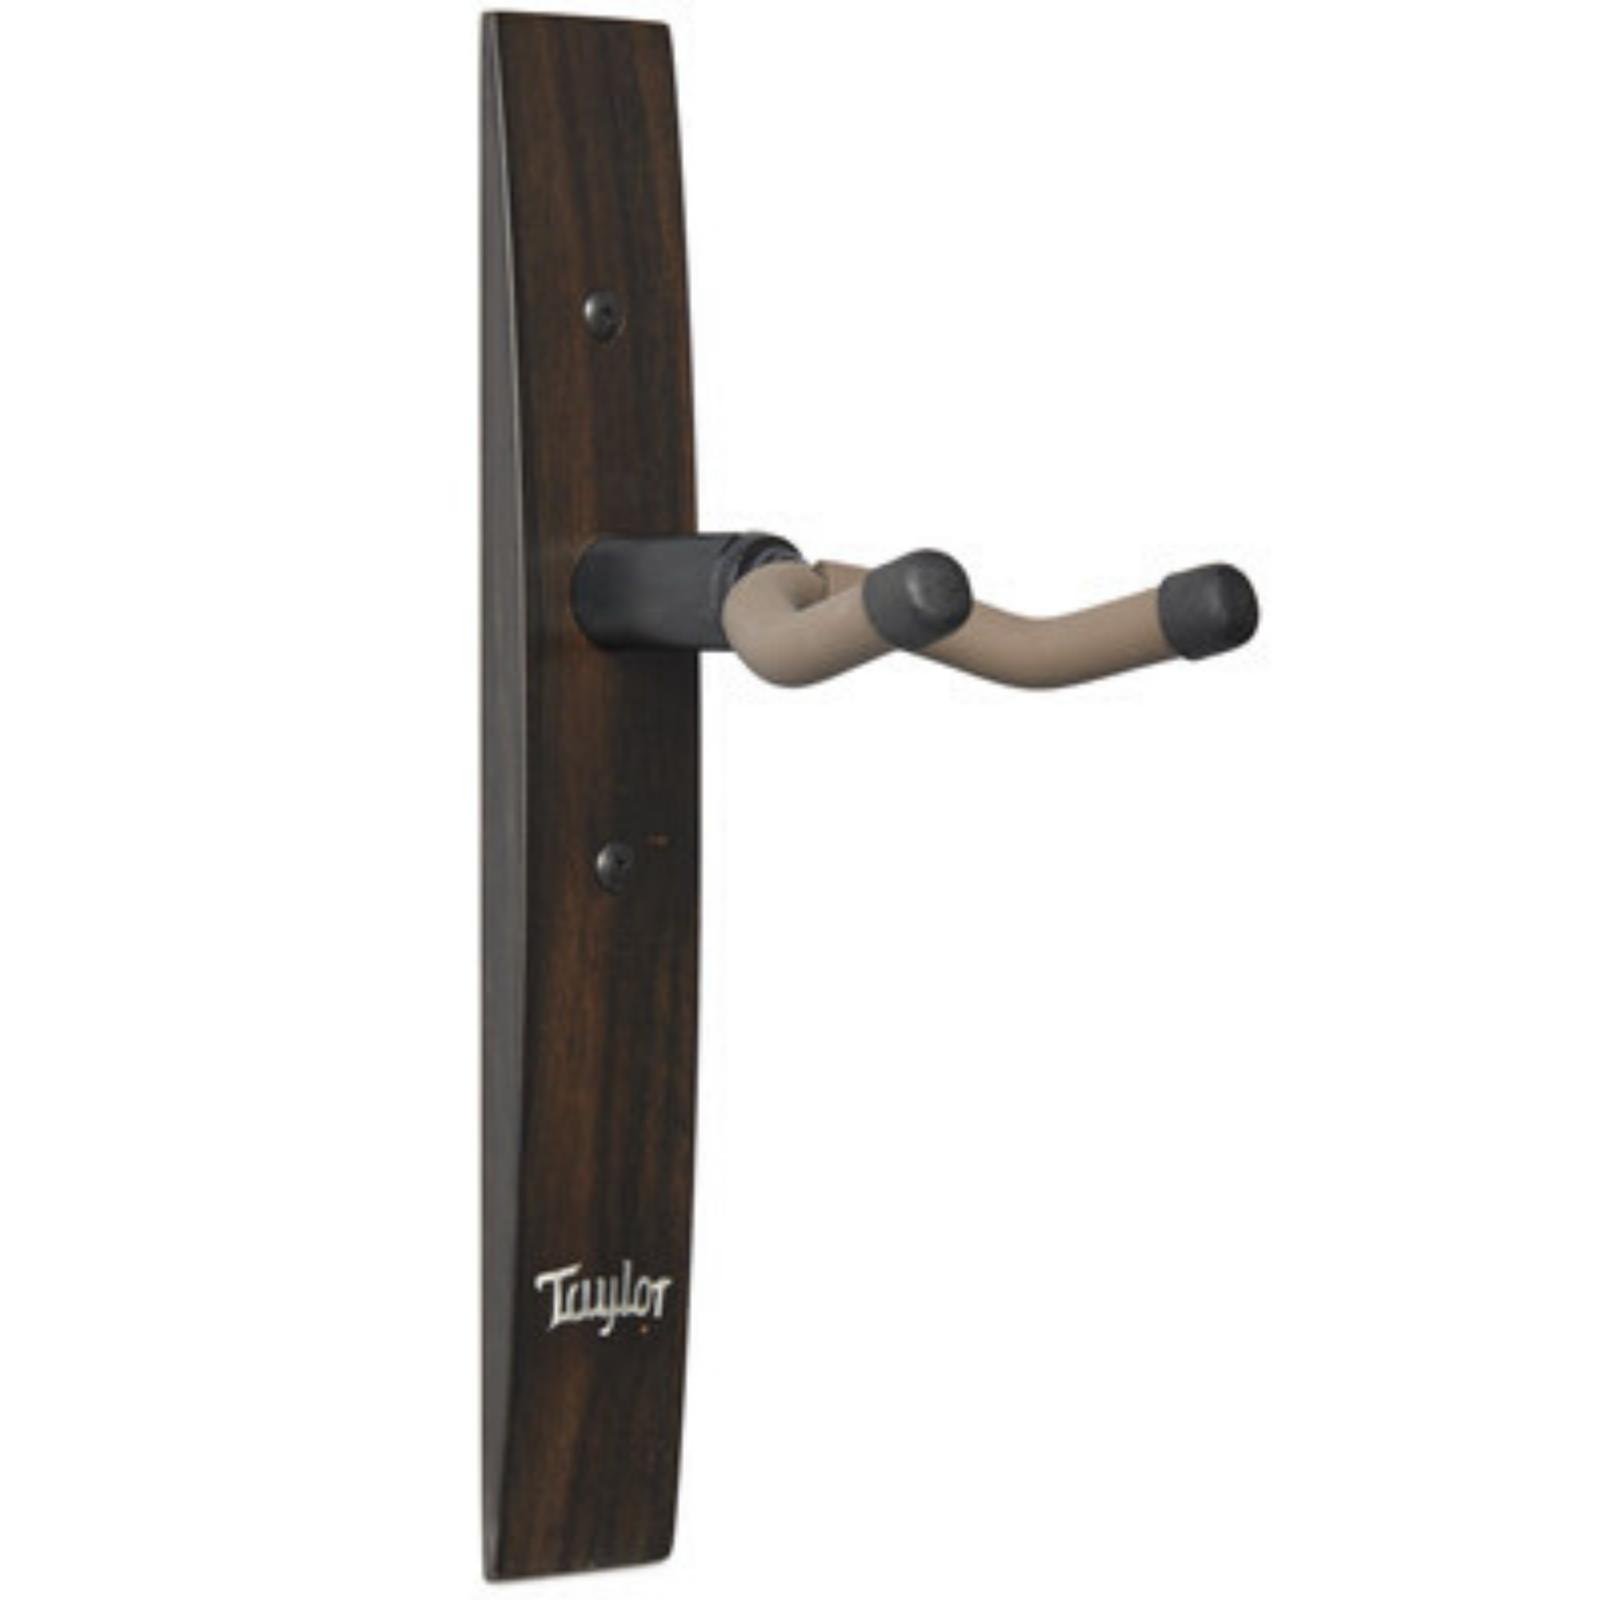 TaylorExotic Wood Ebony Guitar Hanger